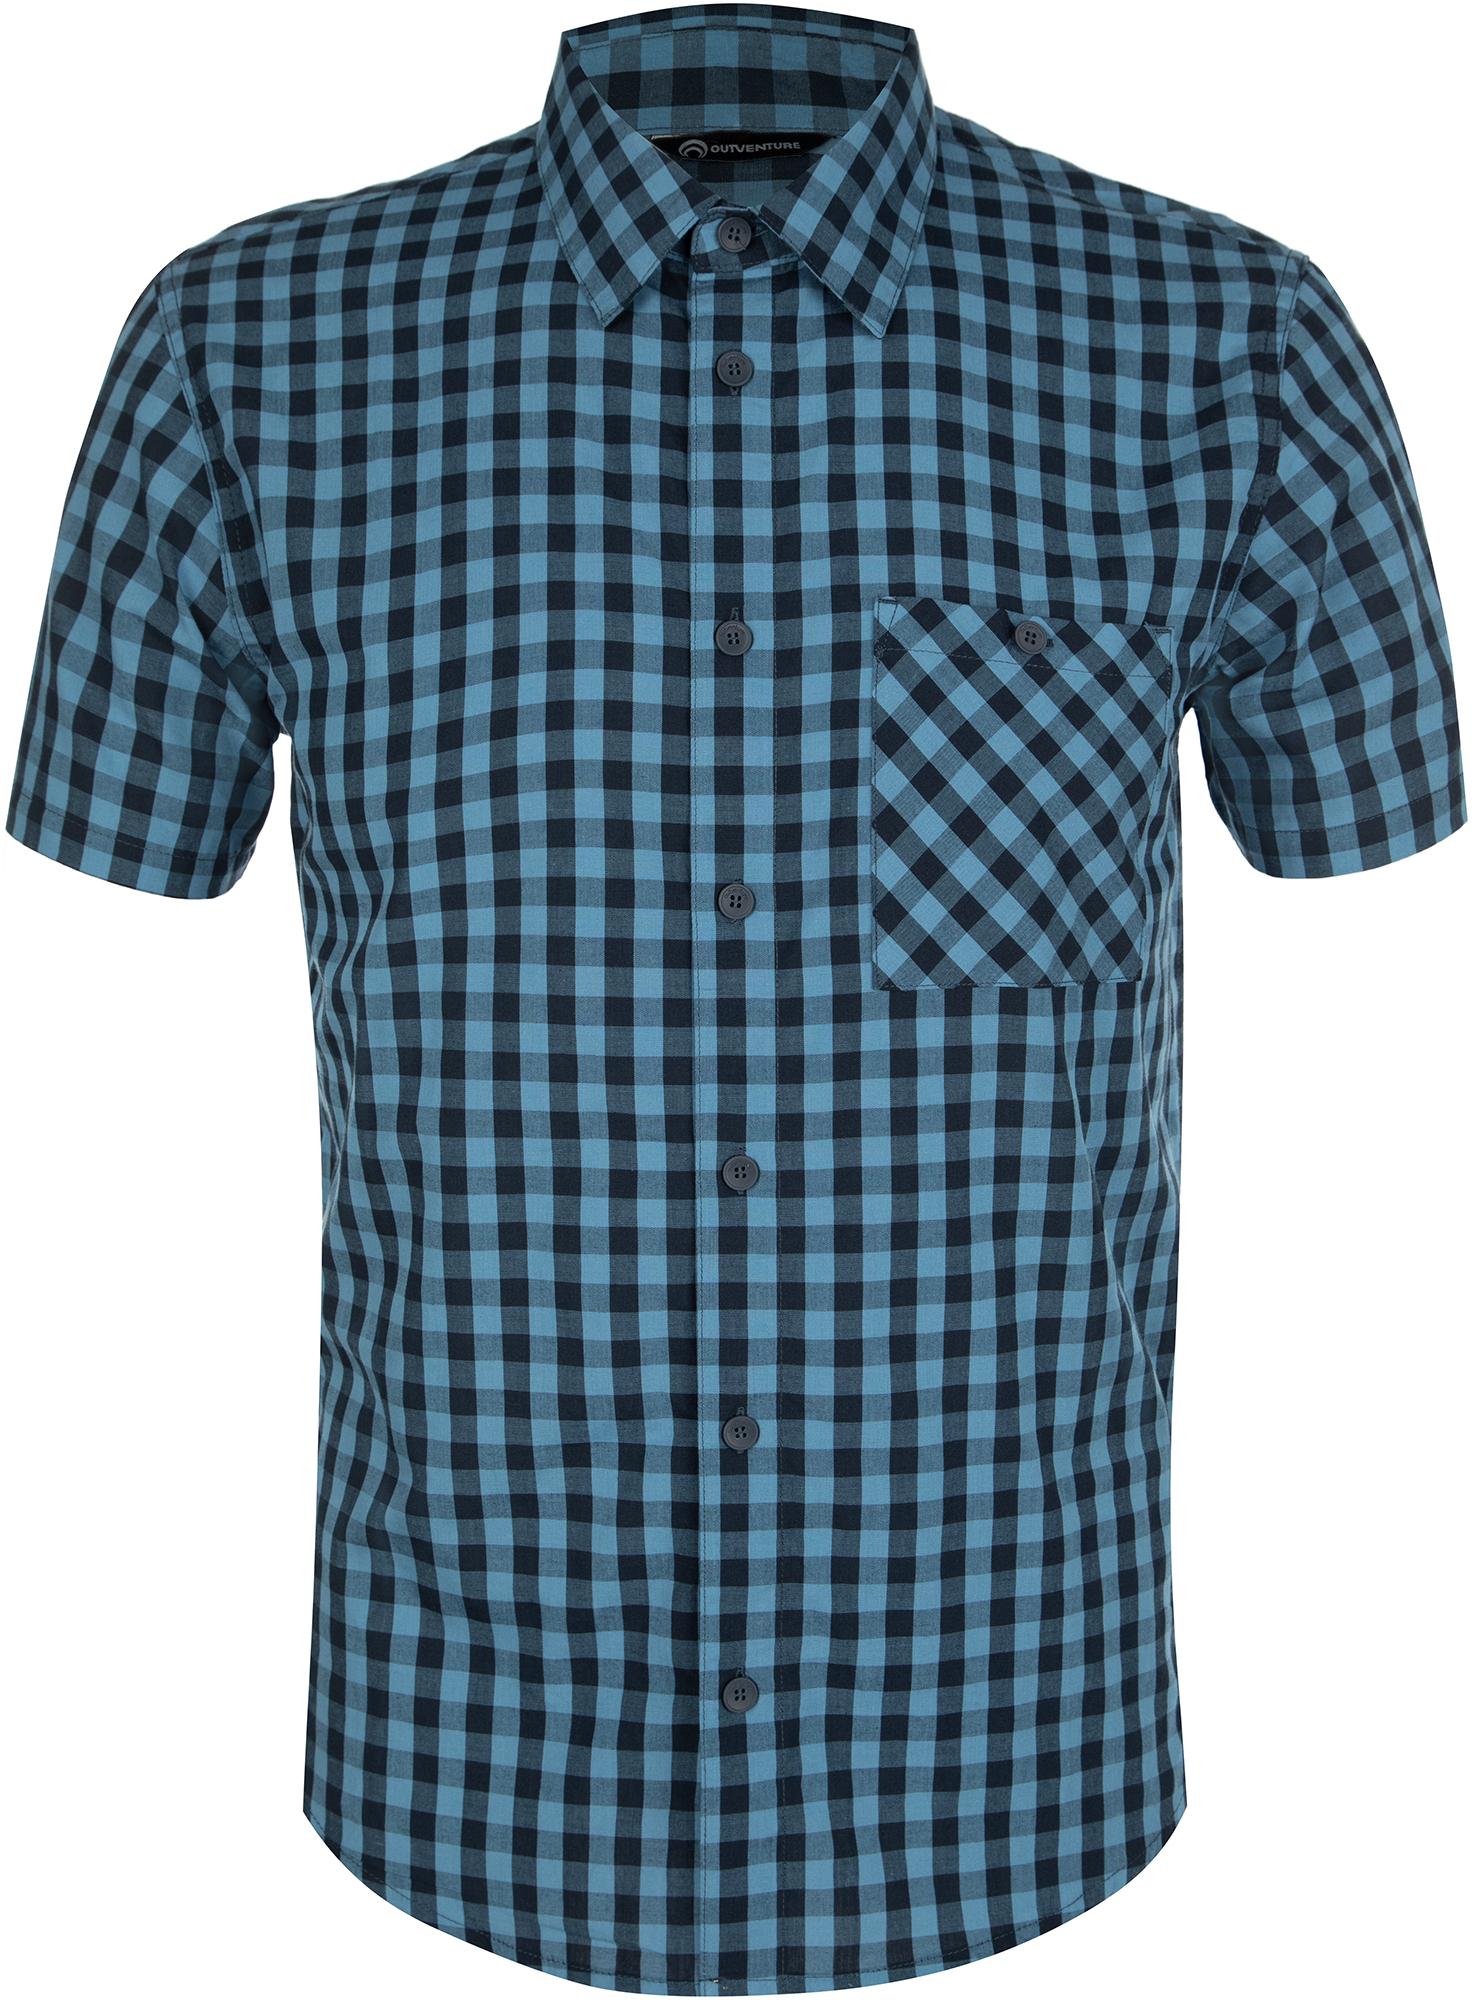 цена на Outventure Рубашка с коротким рукавом мужская Outventure, размер 54